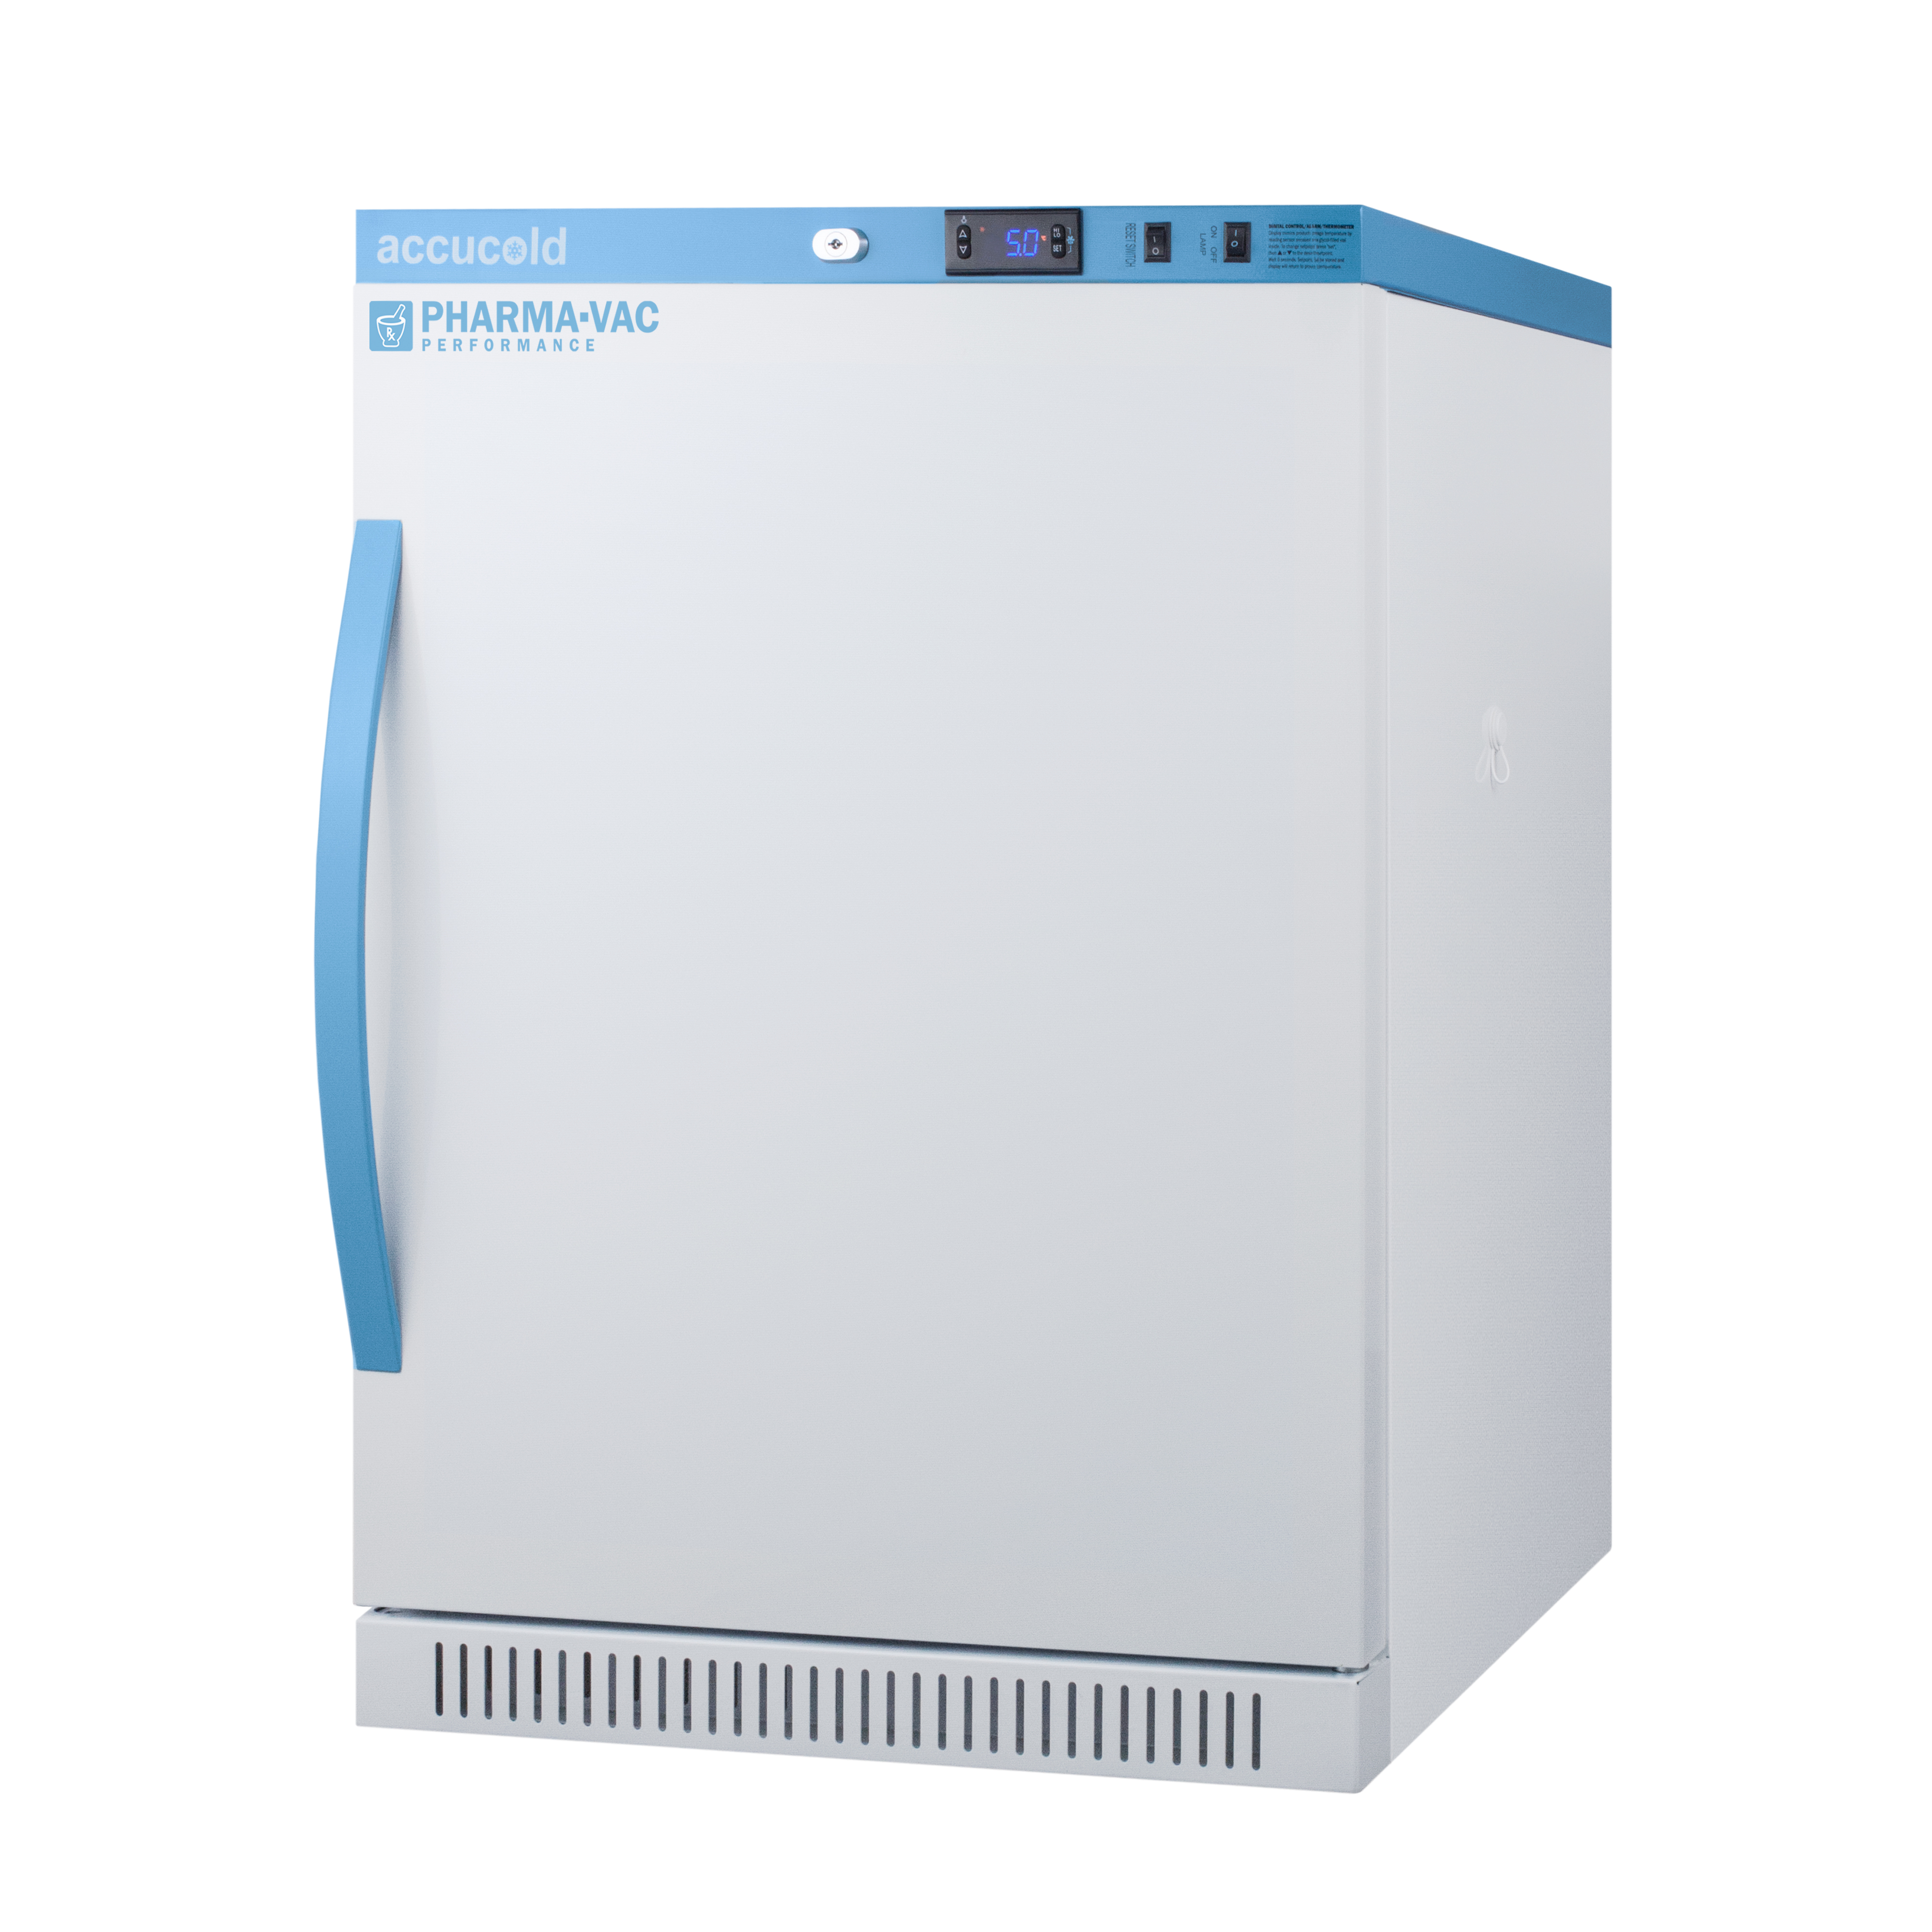 Summit Appliance ARS6PV refrigerator, medical